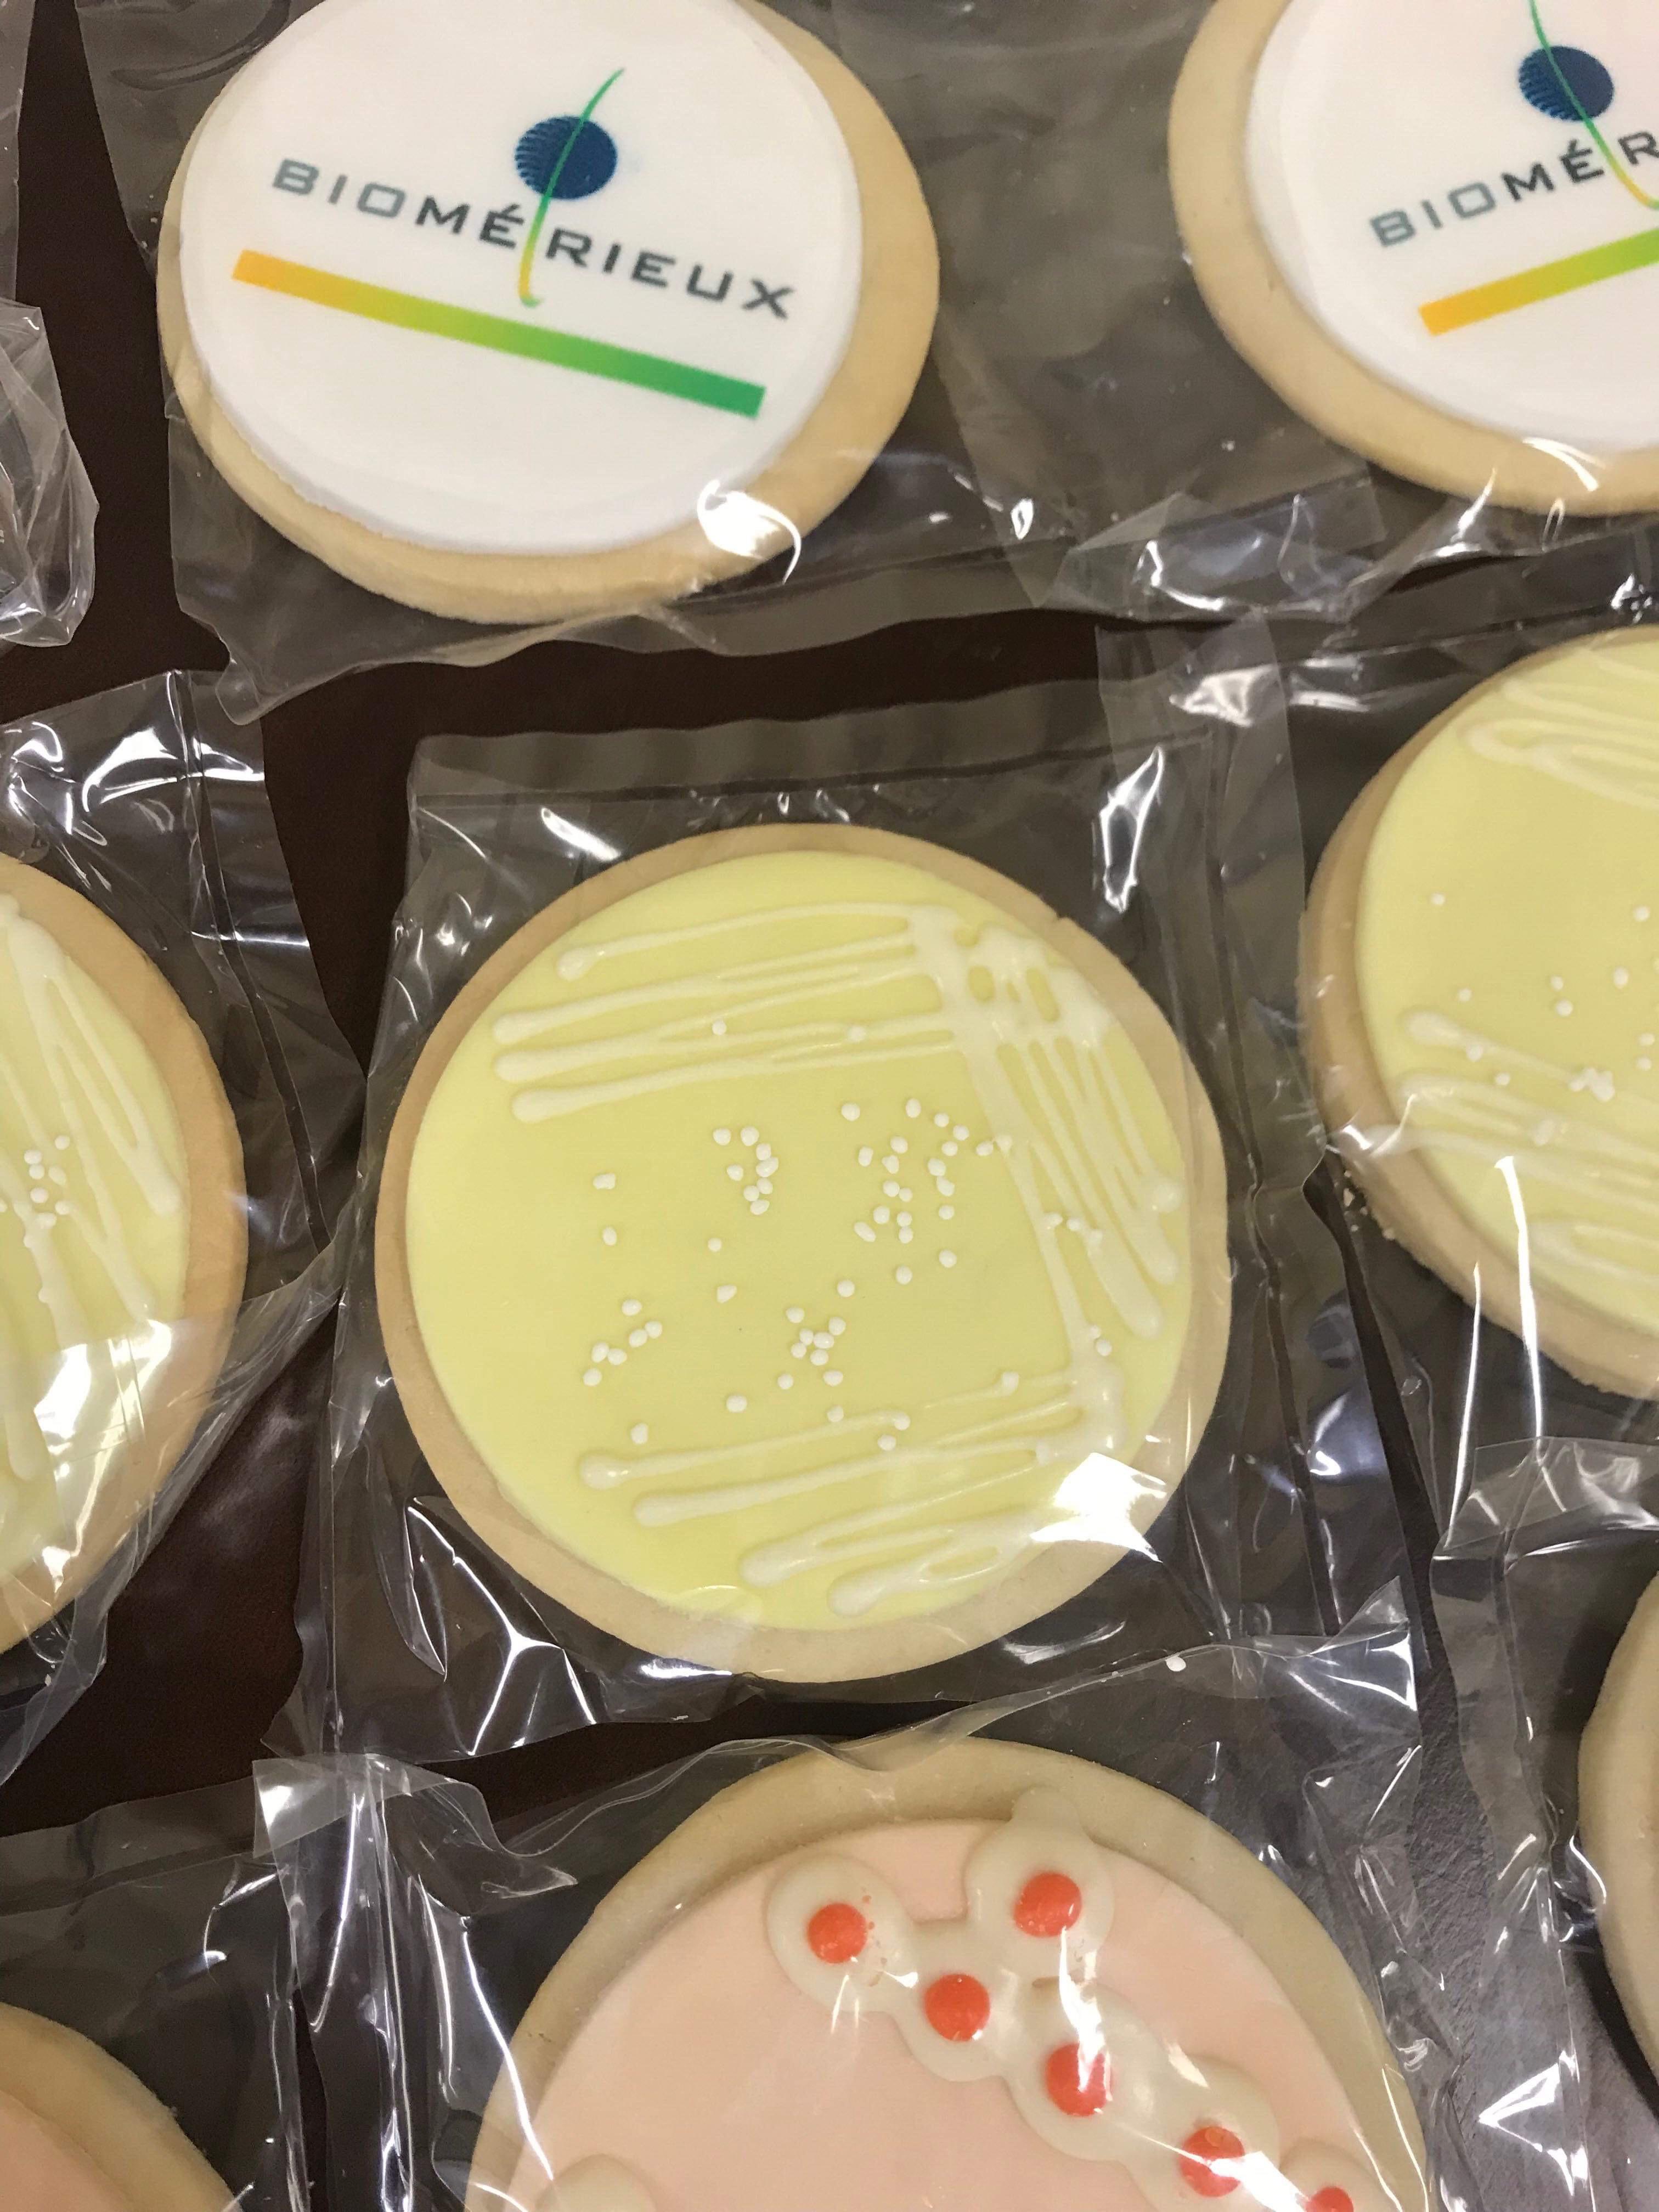 3184, cookies, round, streak plate, inoculation